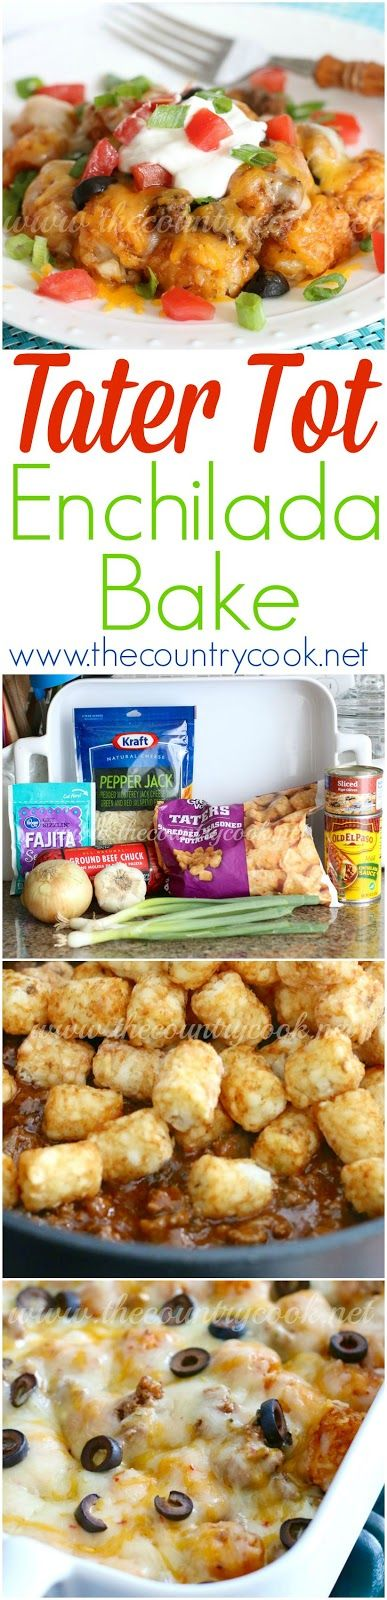 Tater tot enchilada bake   Recipe   Food recipes, Food ...